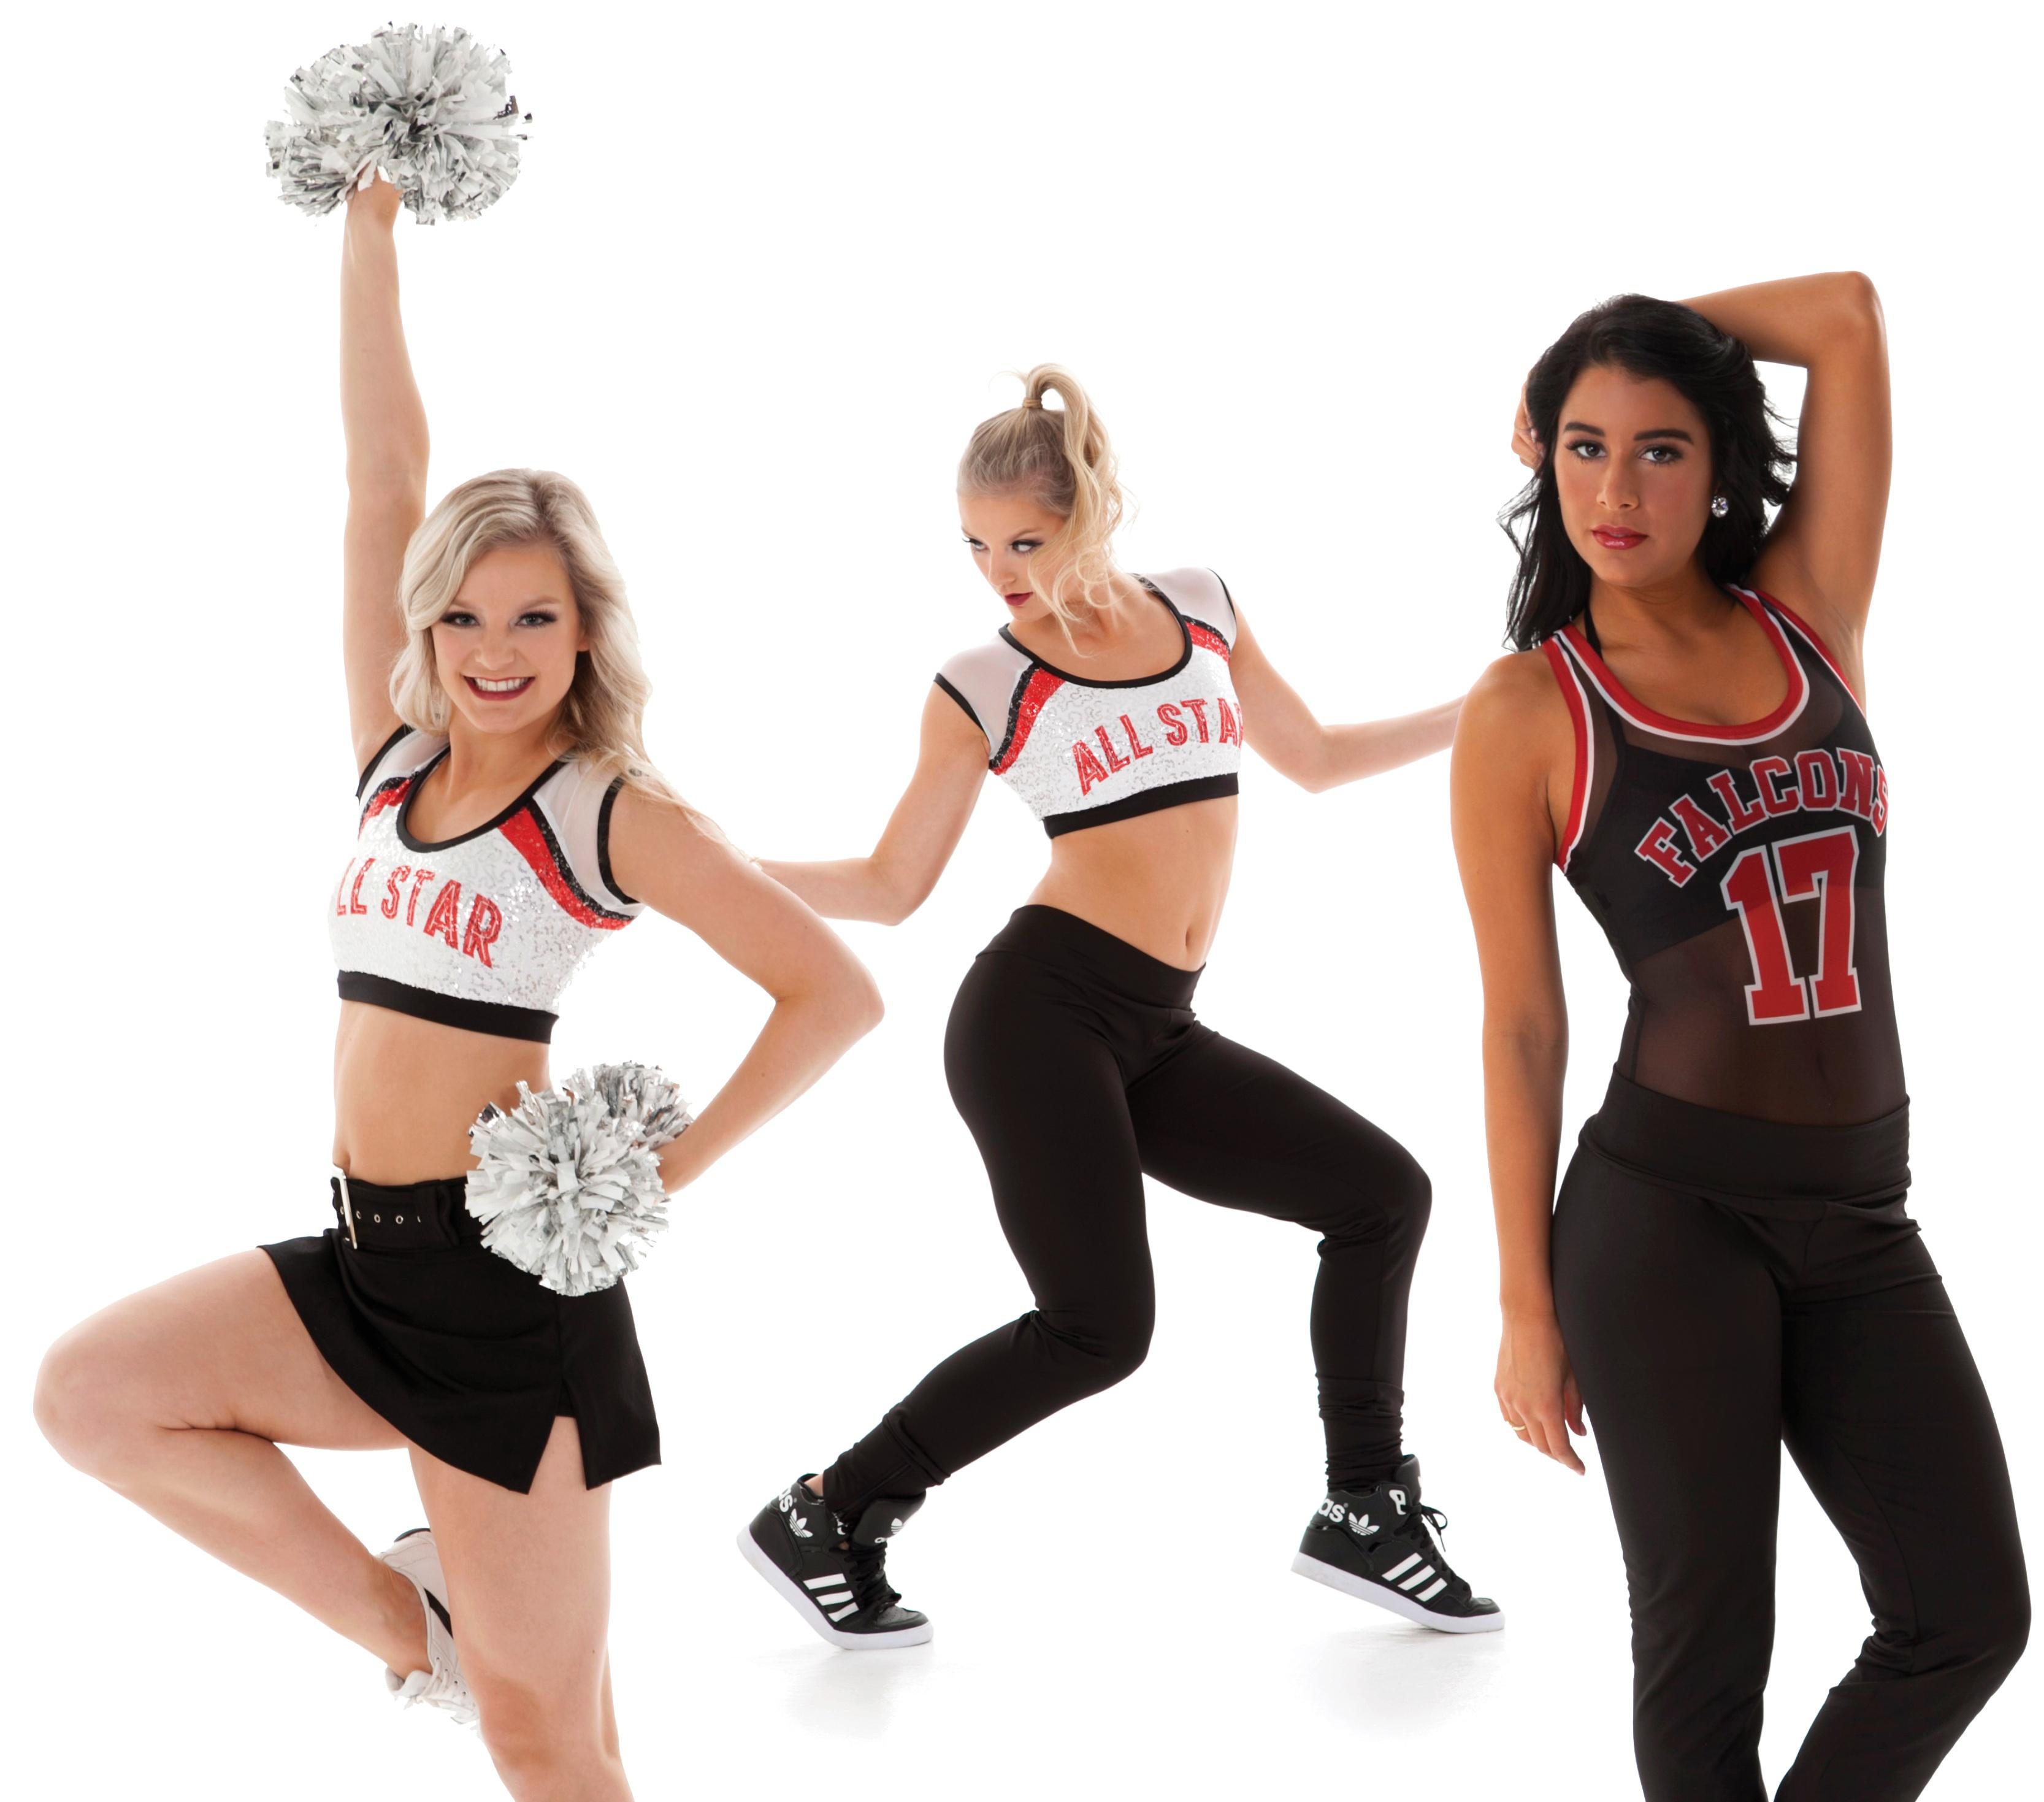 Cheer uniform trend: hip hop